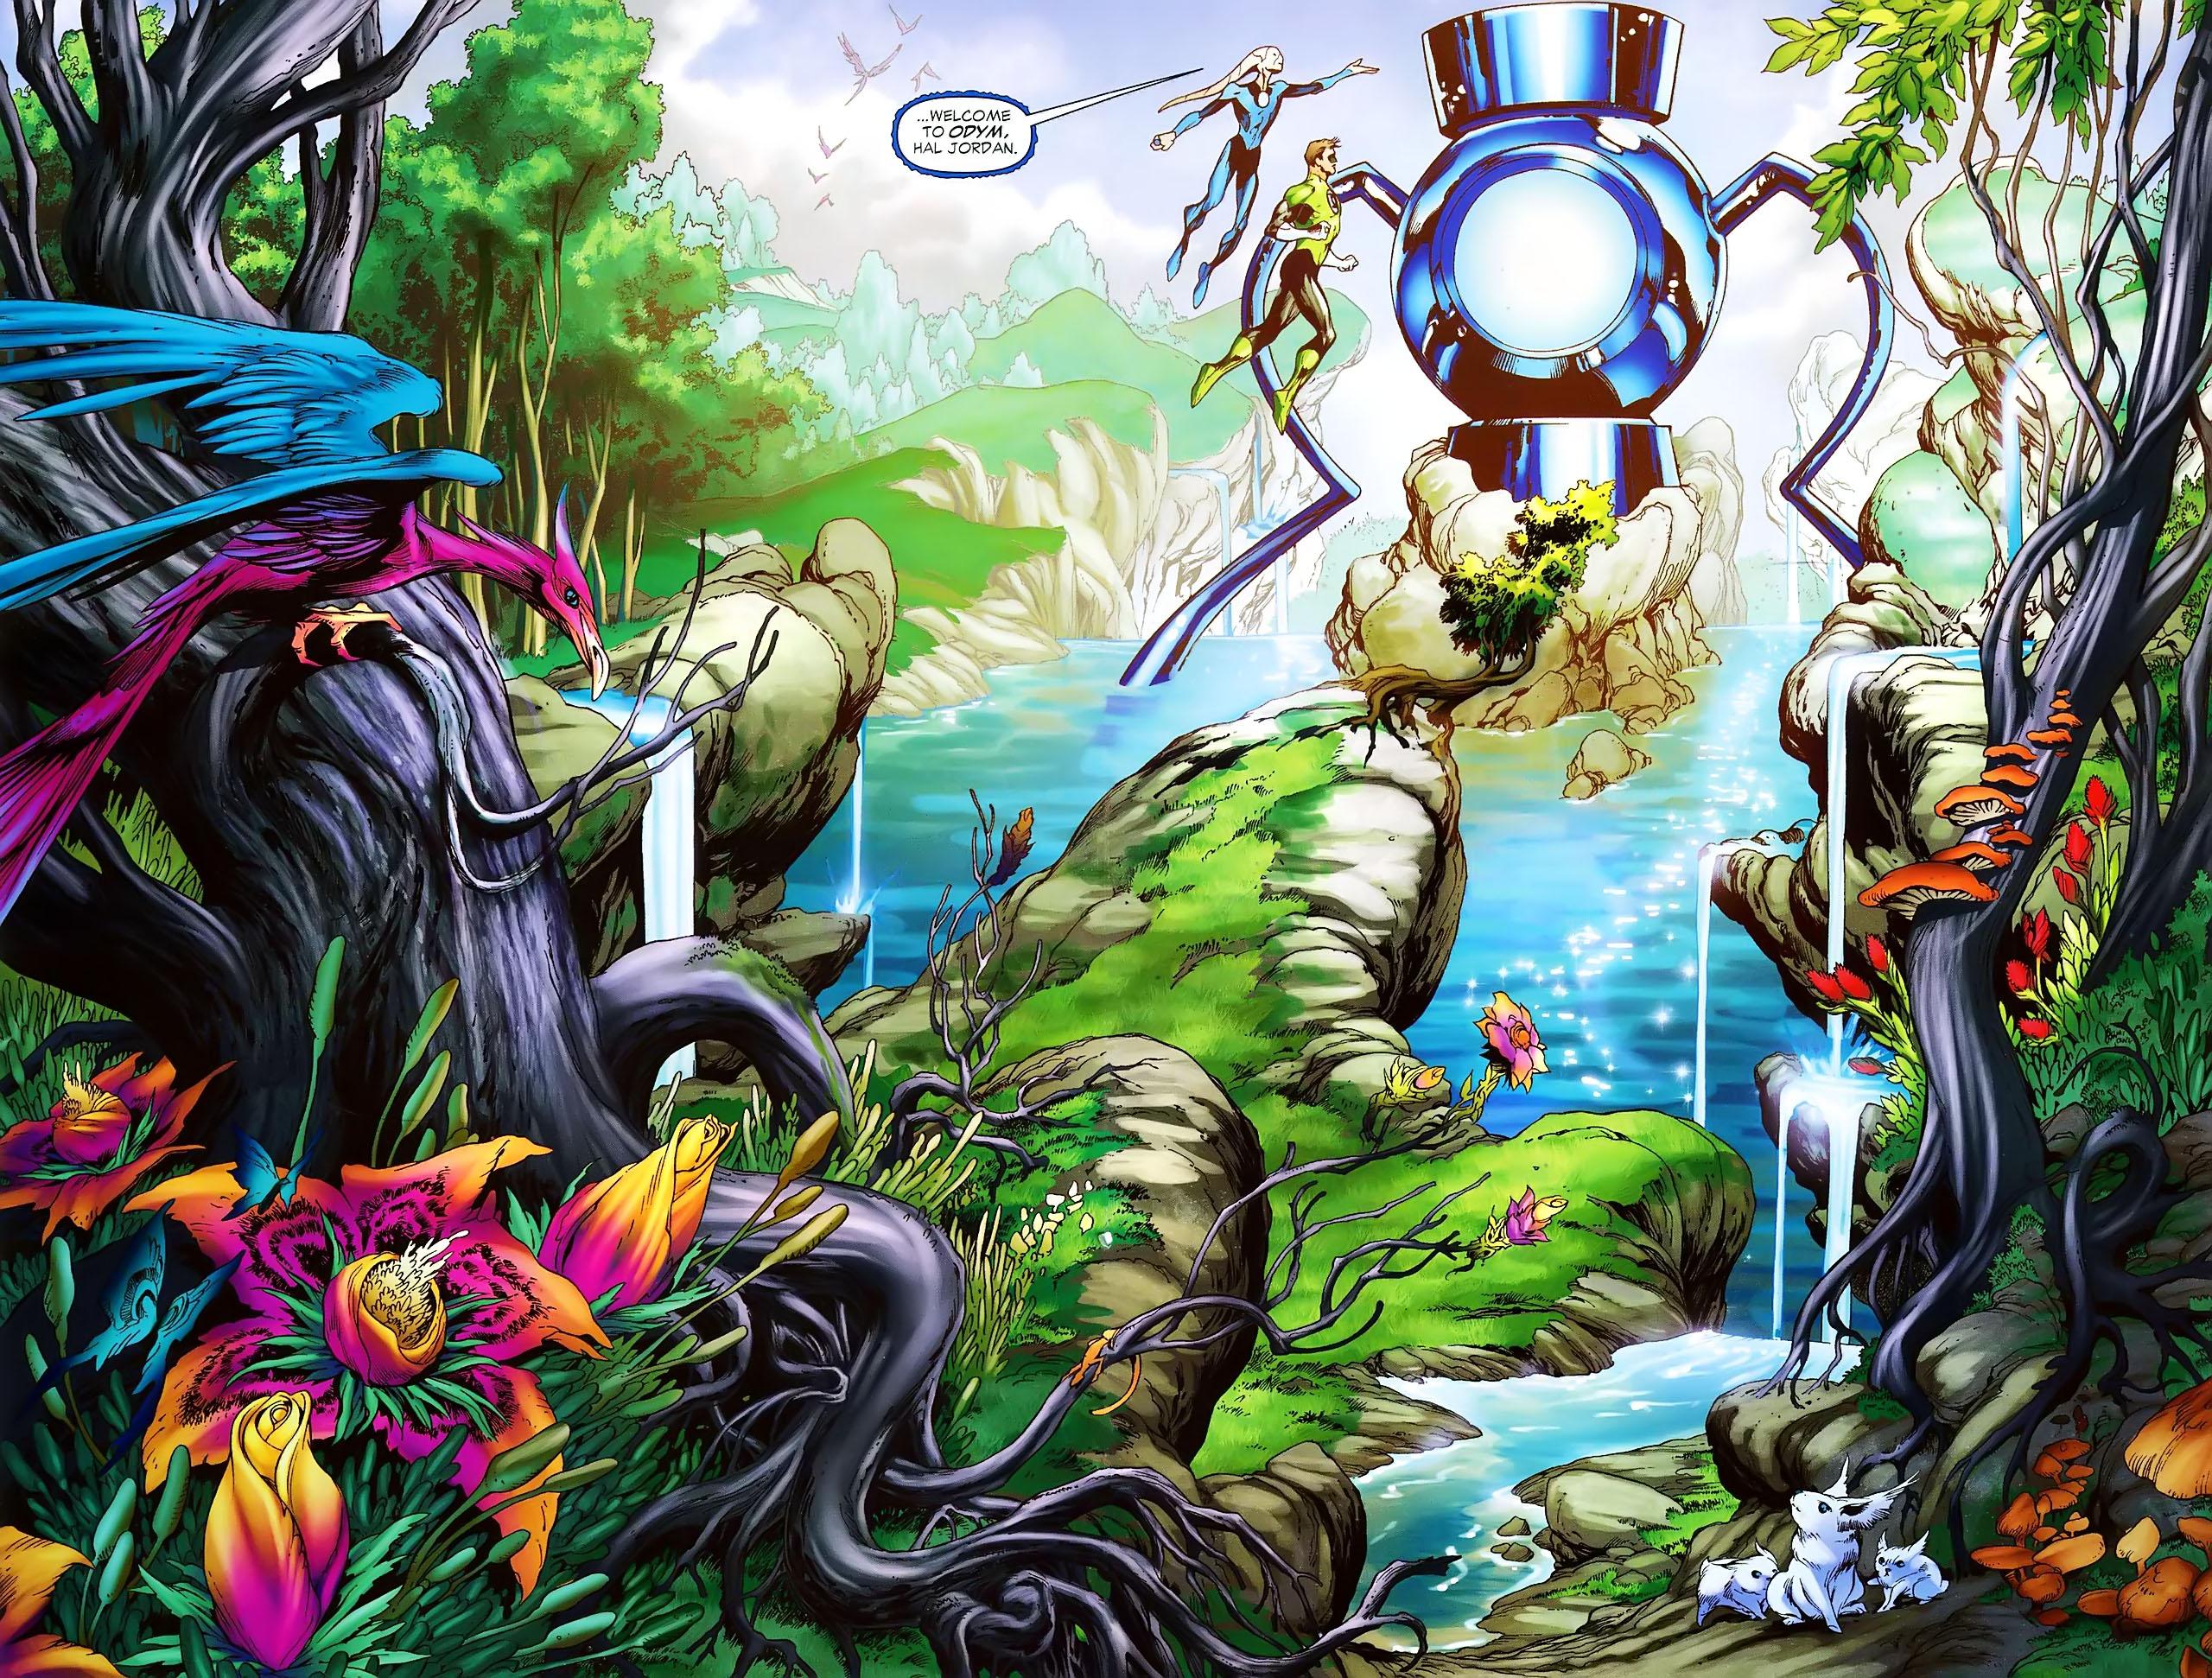 Blue Lantern Corps Computer Wallpapers Desktop Backgrounds 2560x1942